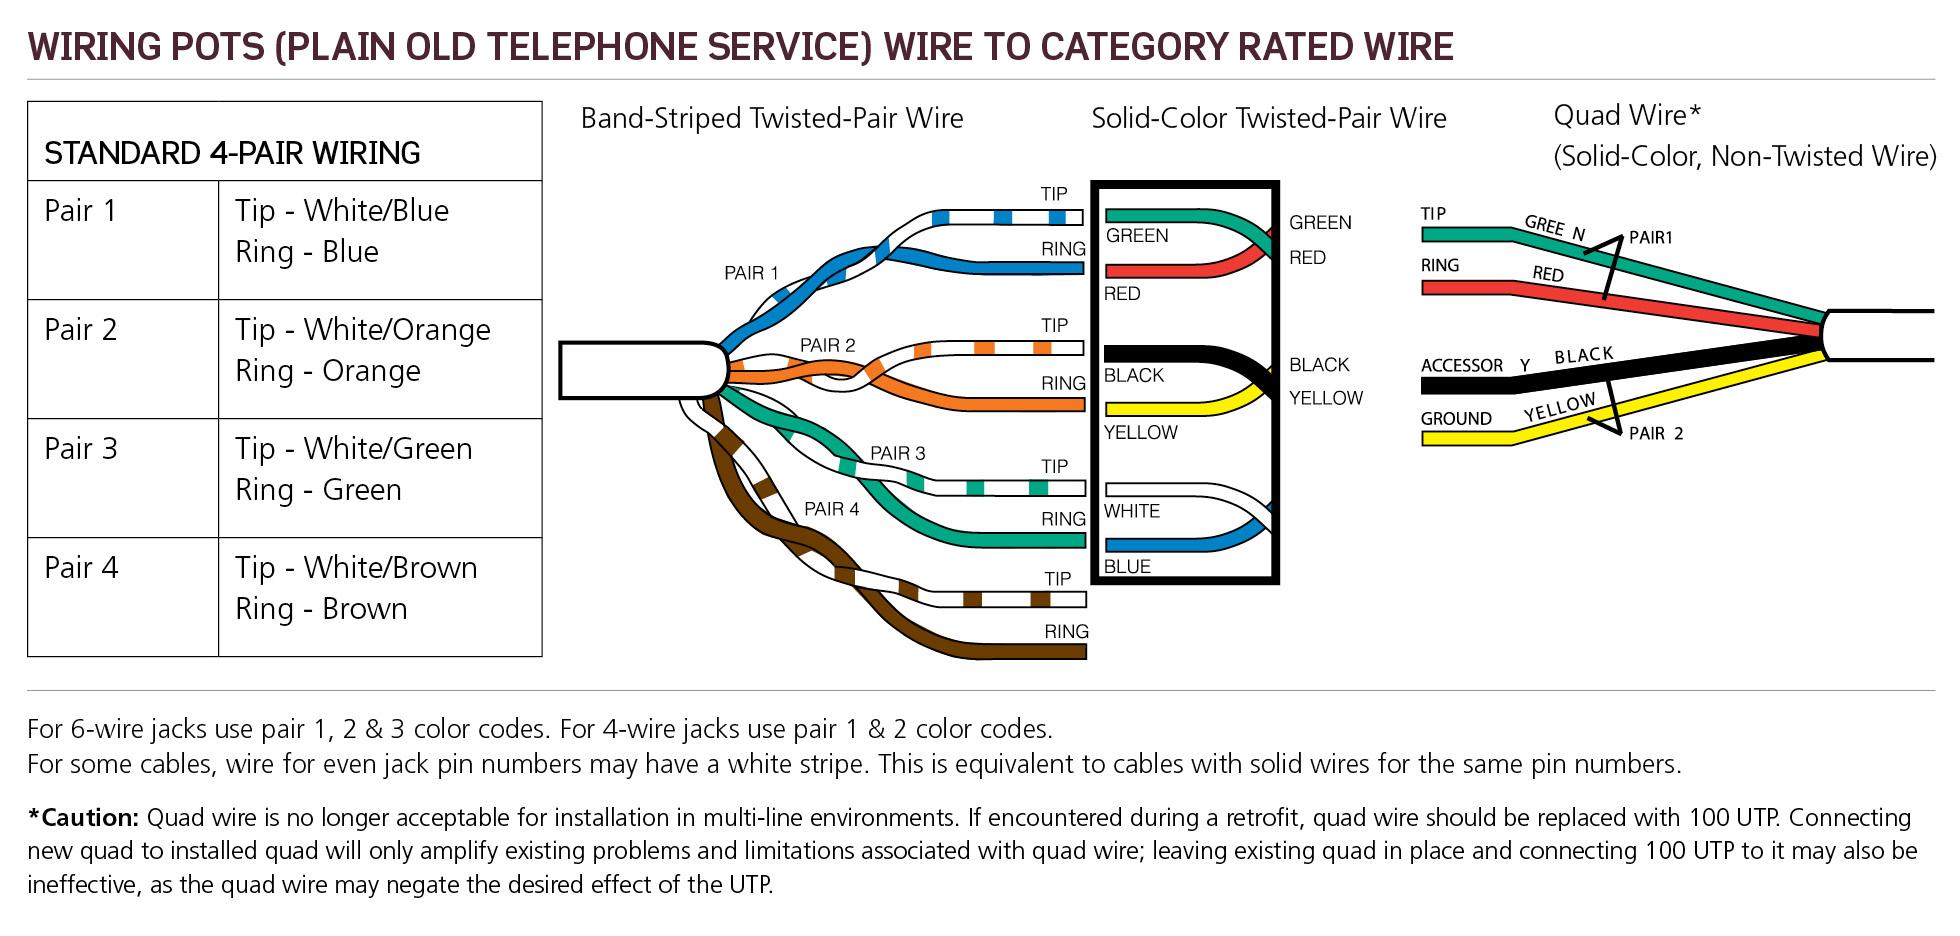 medium resolution of avaya phone wiring color code automotive wiring diagrams camera system wiring diagrams on cat 5 wiring color code diagram